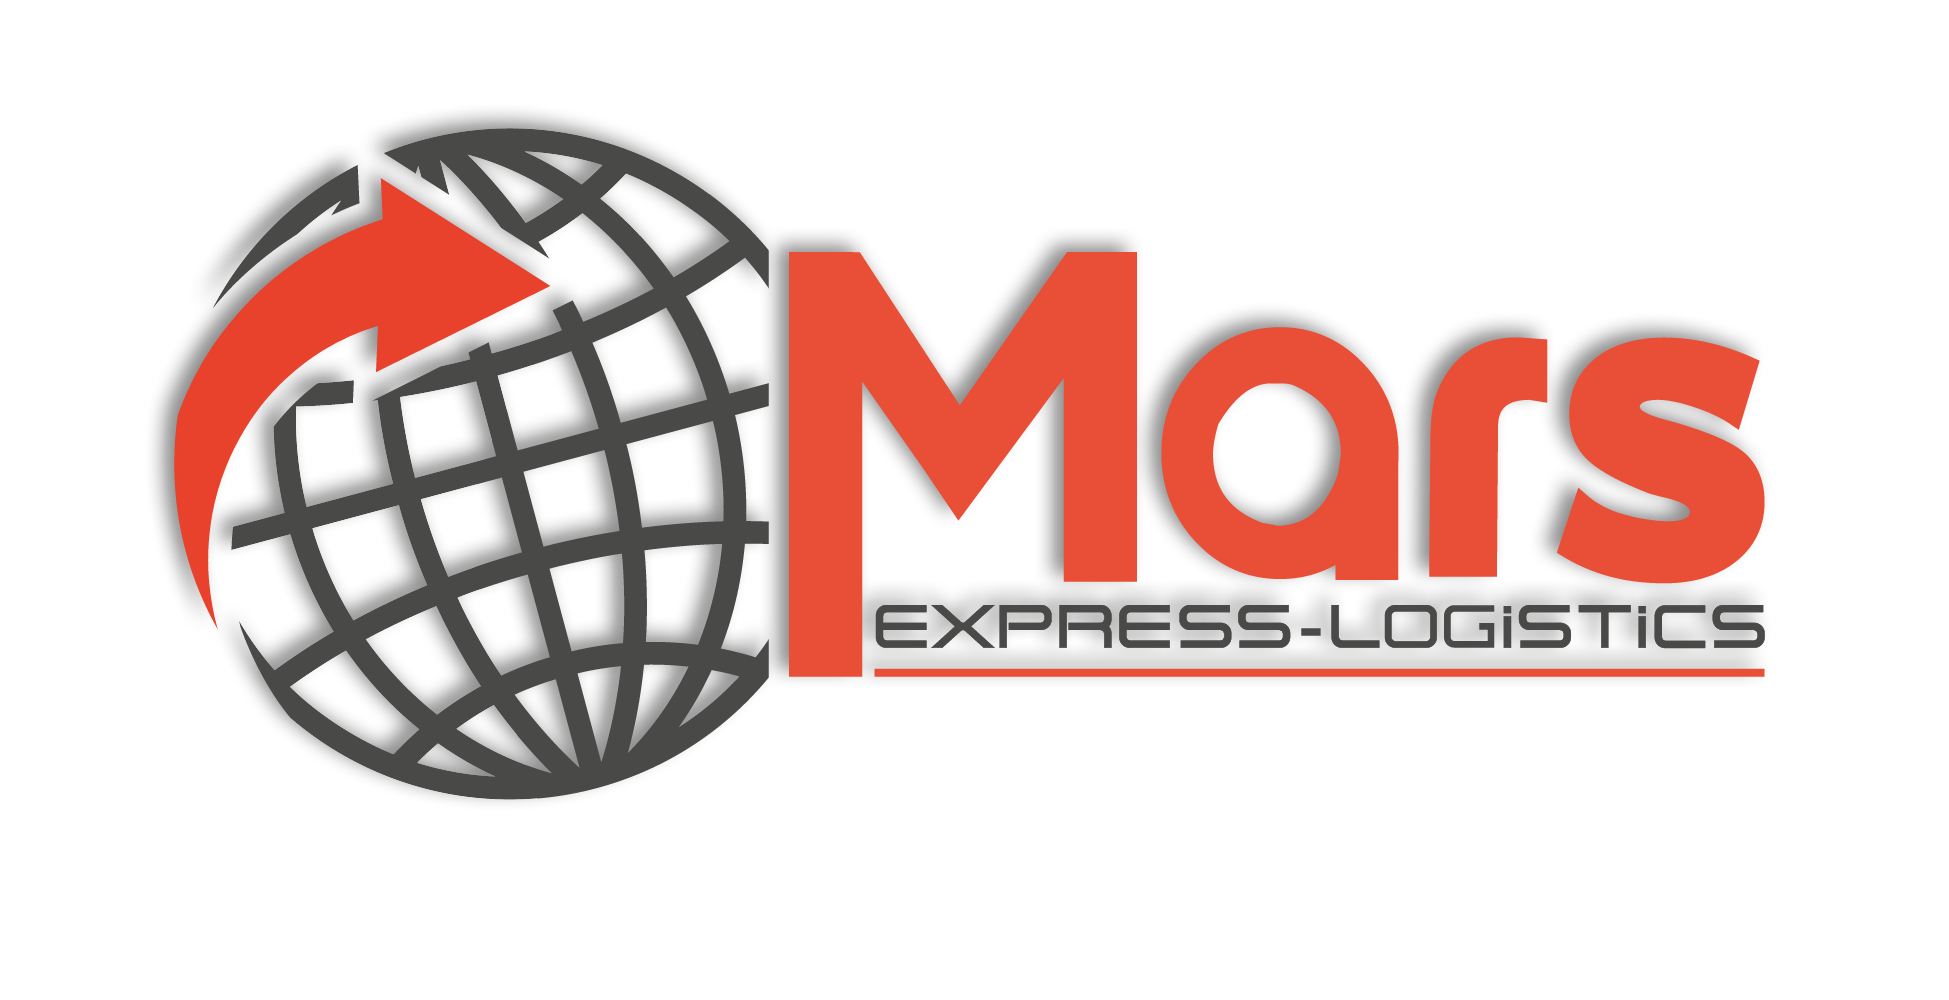 Mars Express-Logistiсs